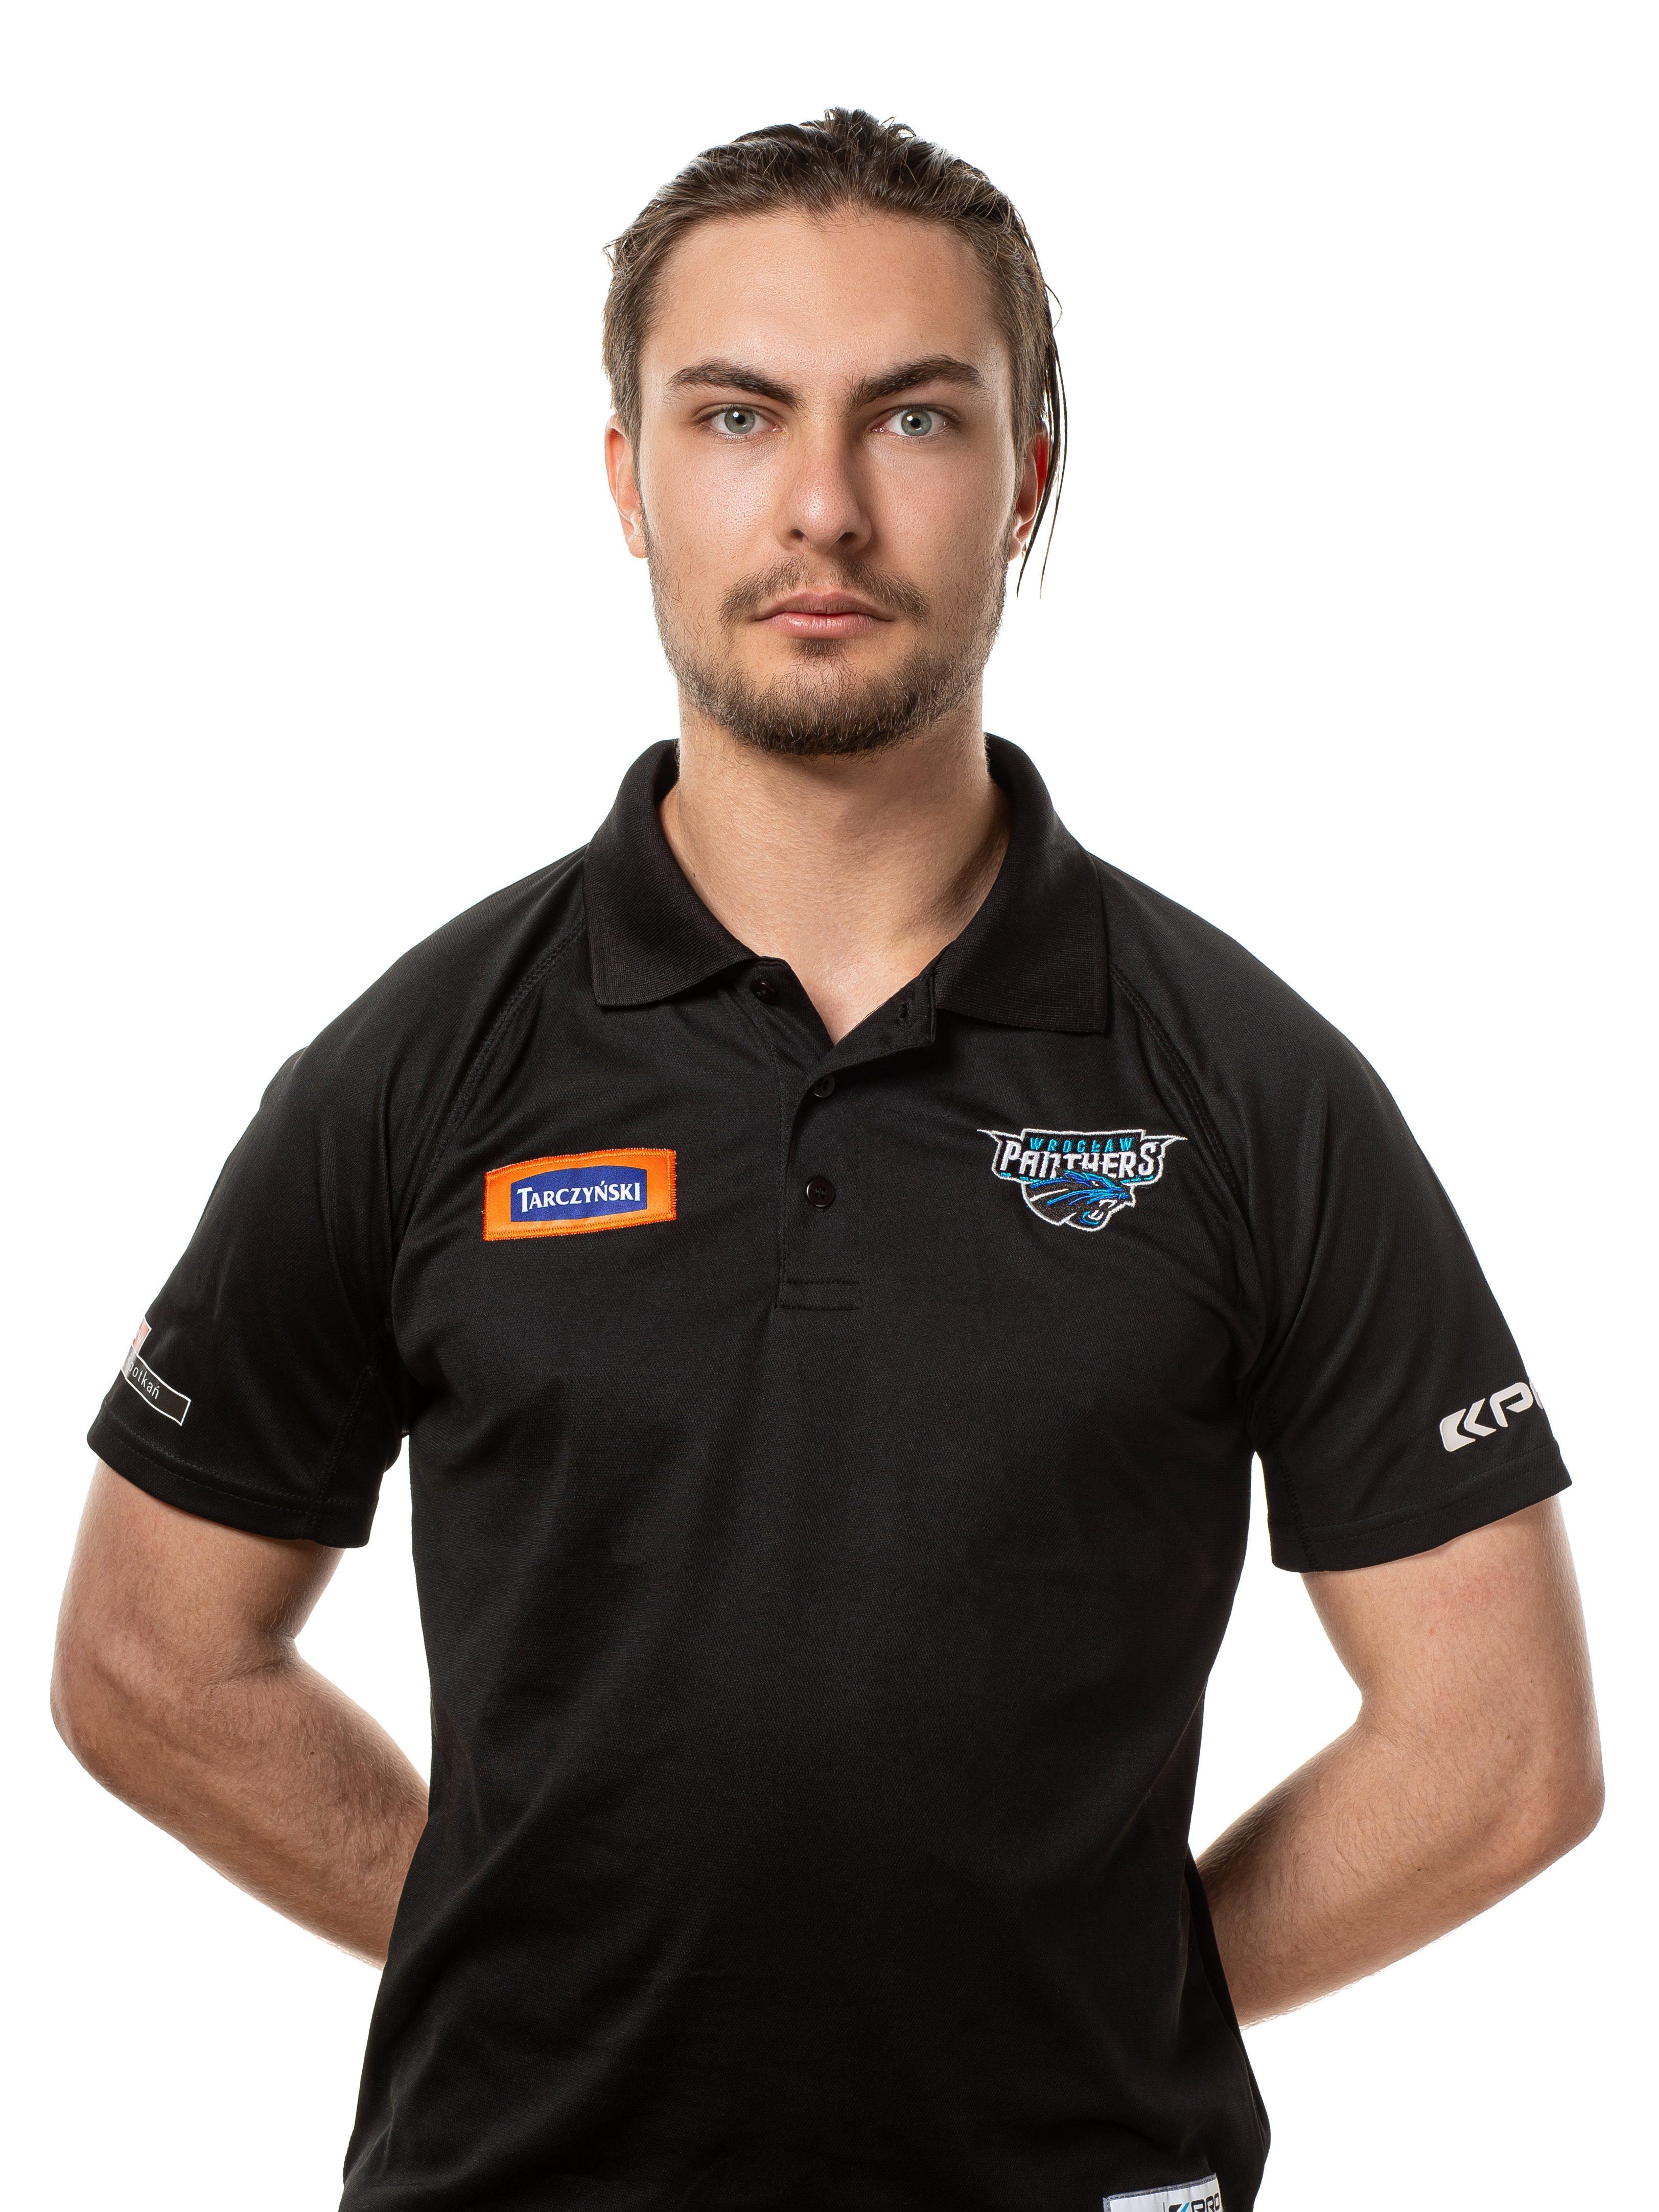 Tobiasz Witalis